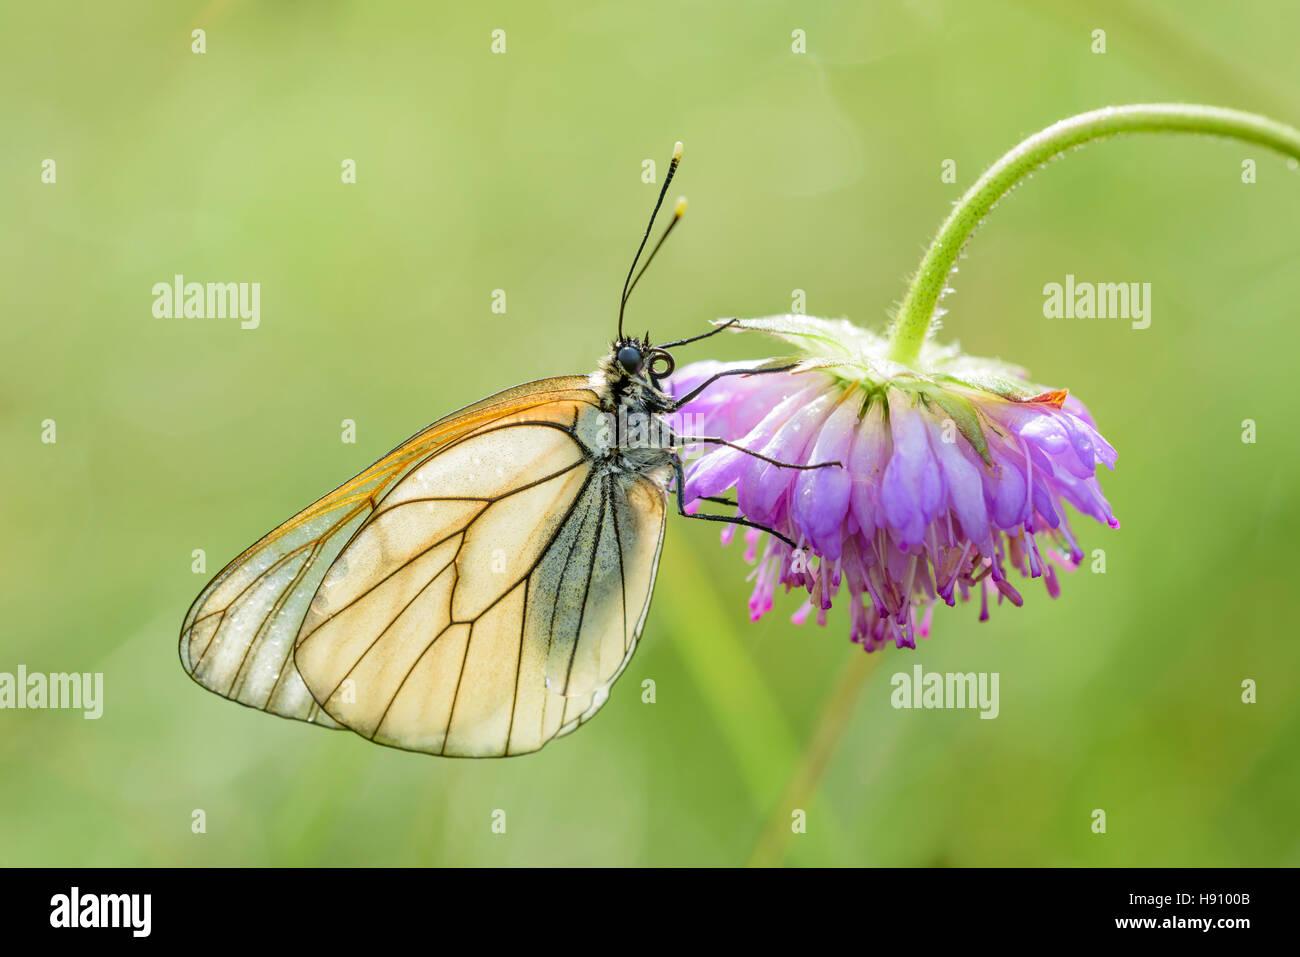 Baum Weissling, Aporia crataegi, Black veined White butterfly - Stock Image